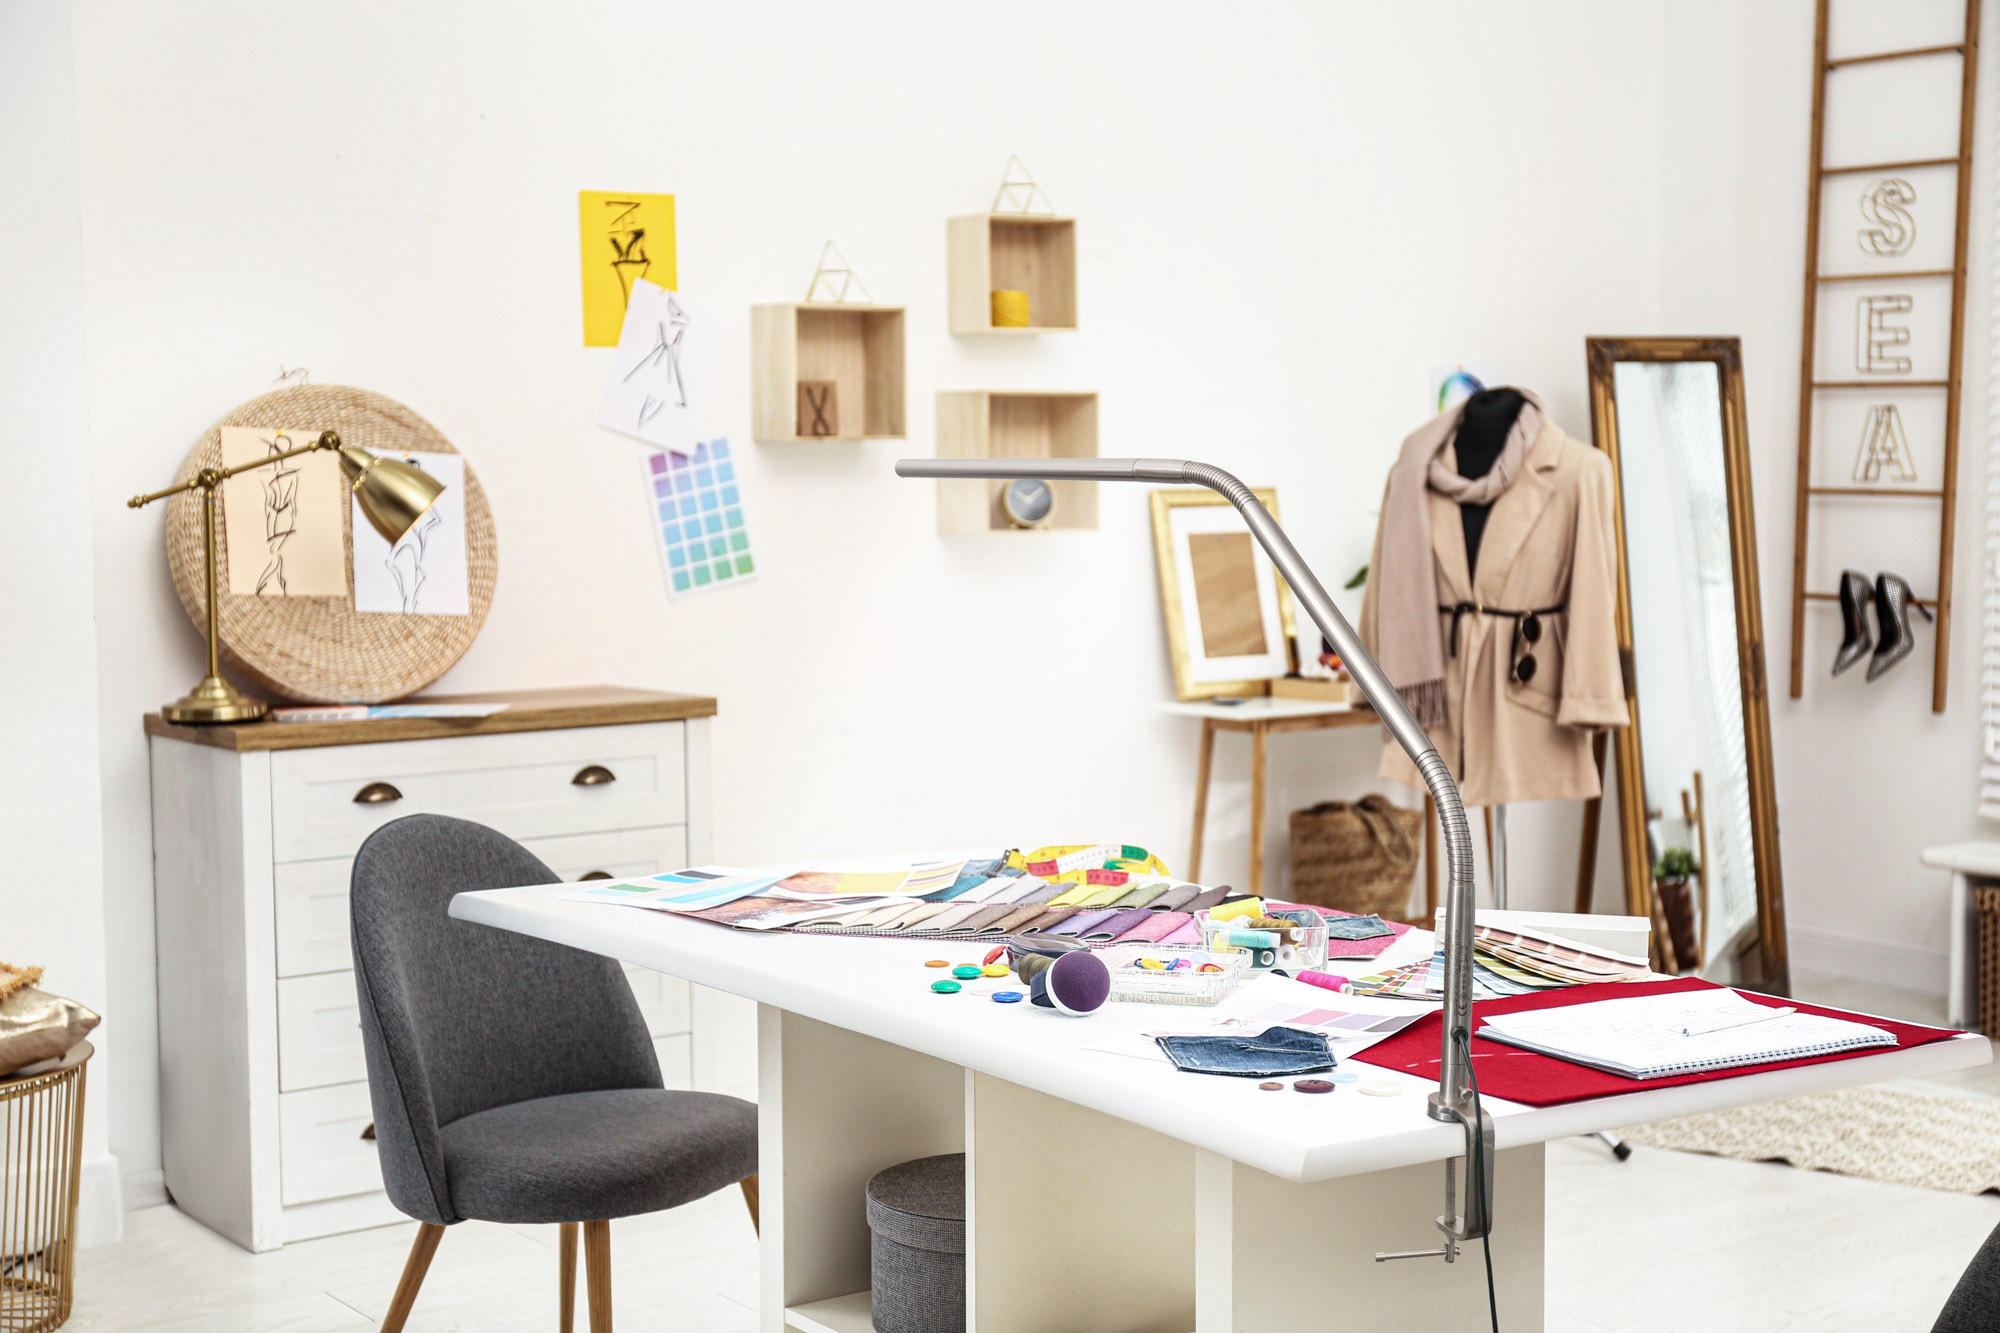 Slimline 3 Table Clothes designer Lamp